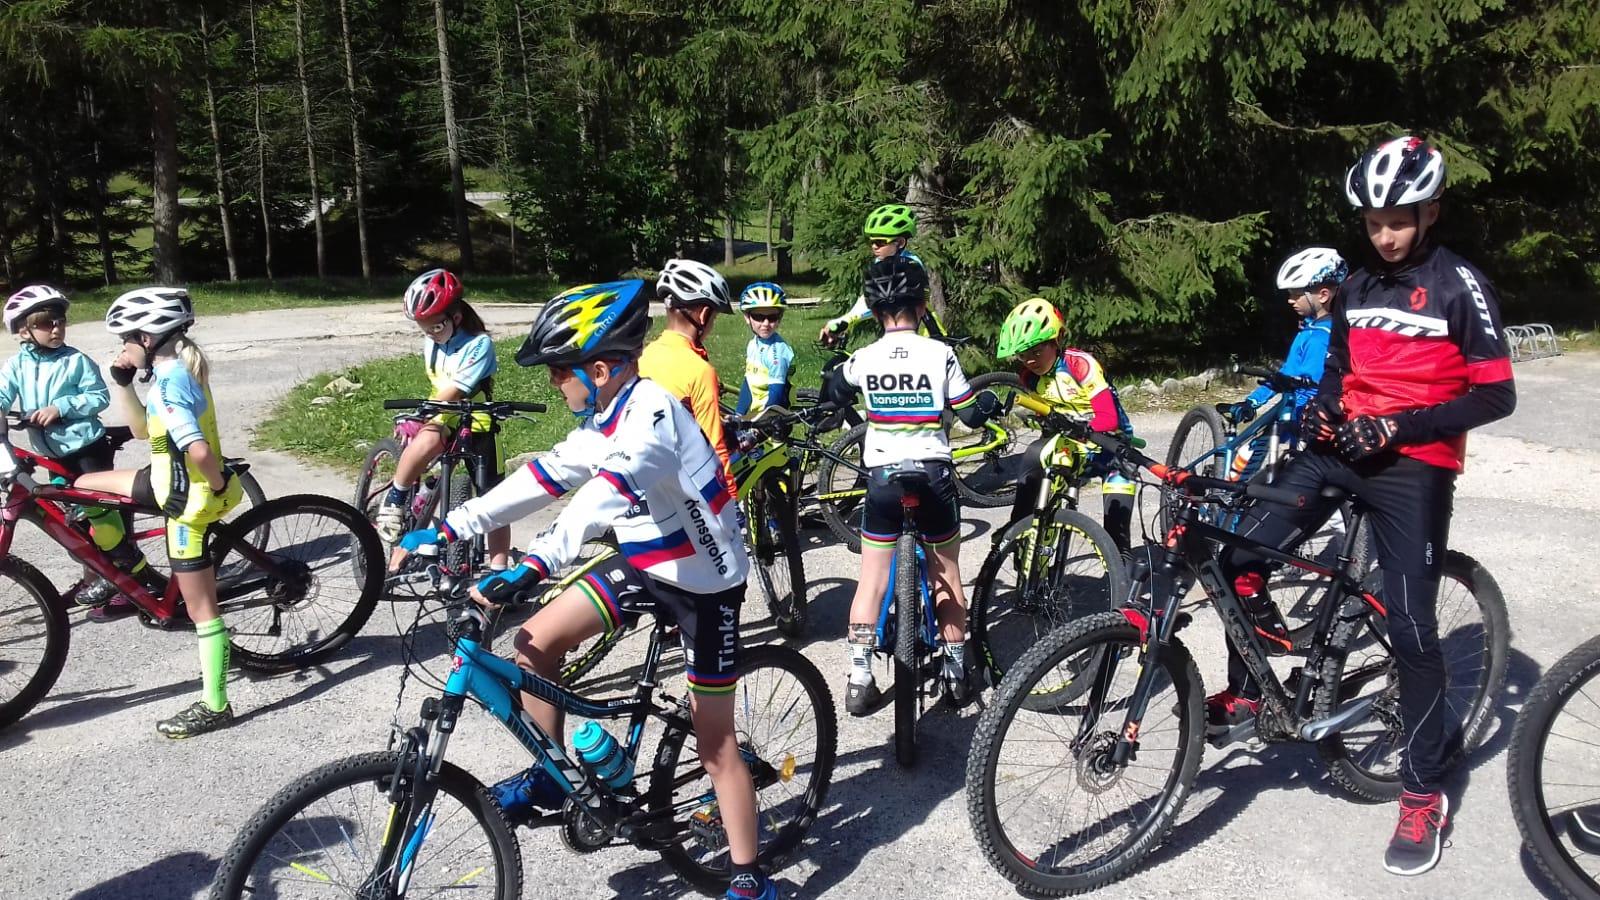 90980b0960e0e Kemp Petra Sagana 2018 - Rajecká Lesná - Cyklokempy Petra Sagana